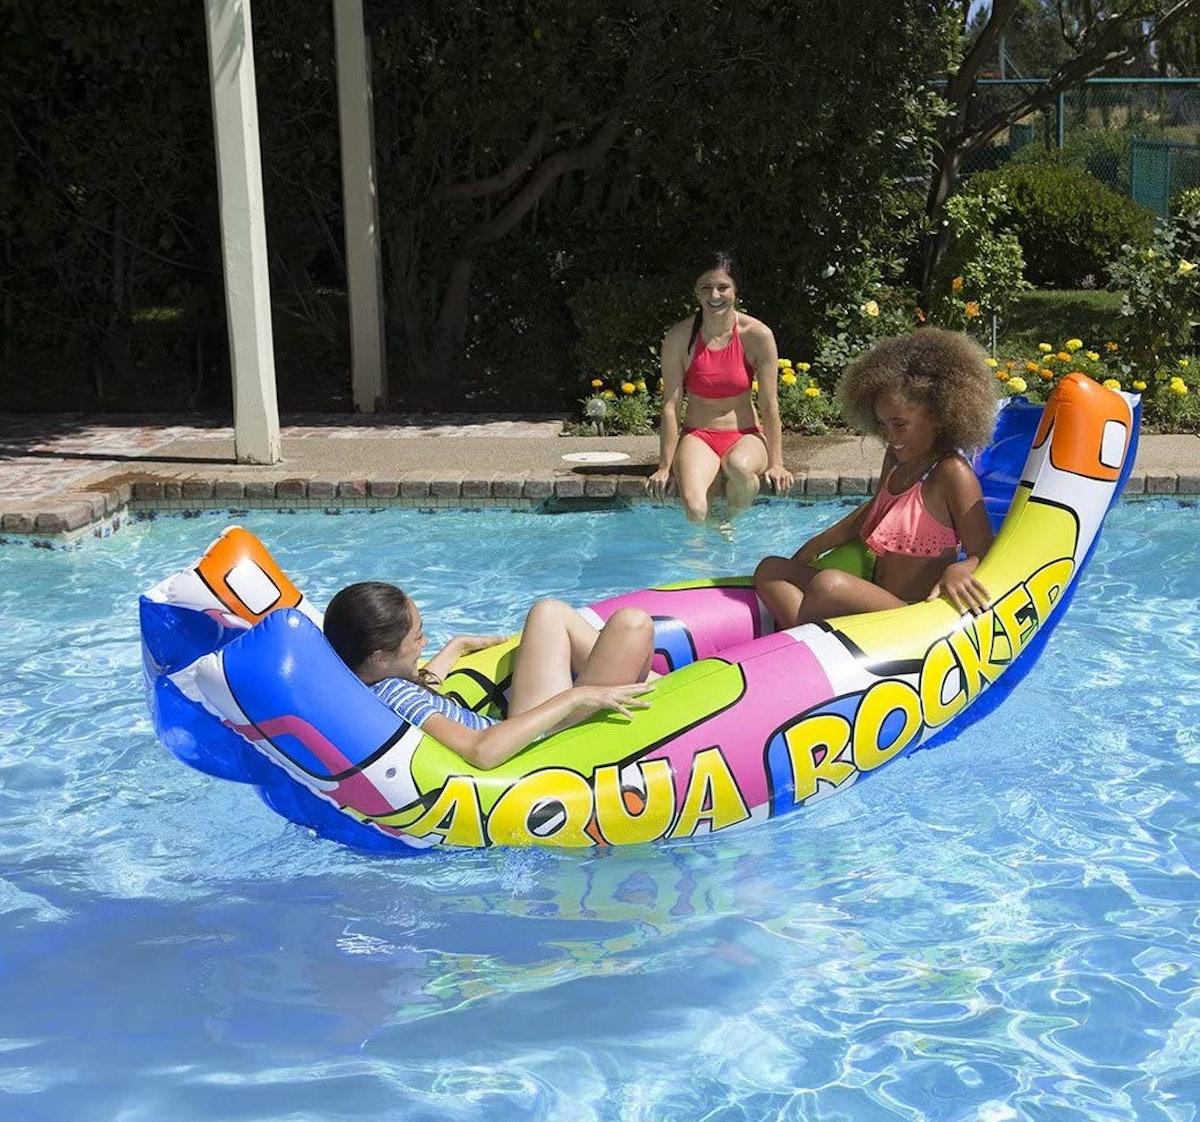 Poolmaster Aqua Rocker